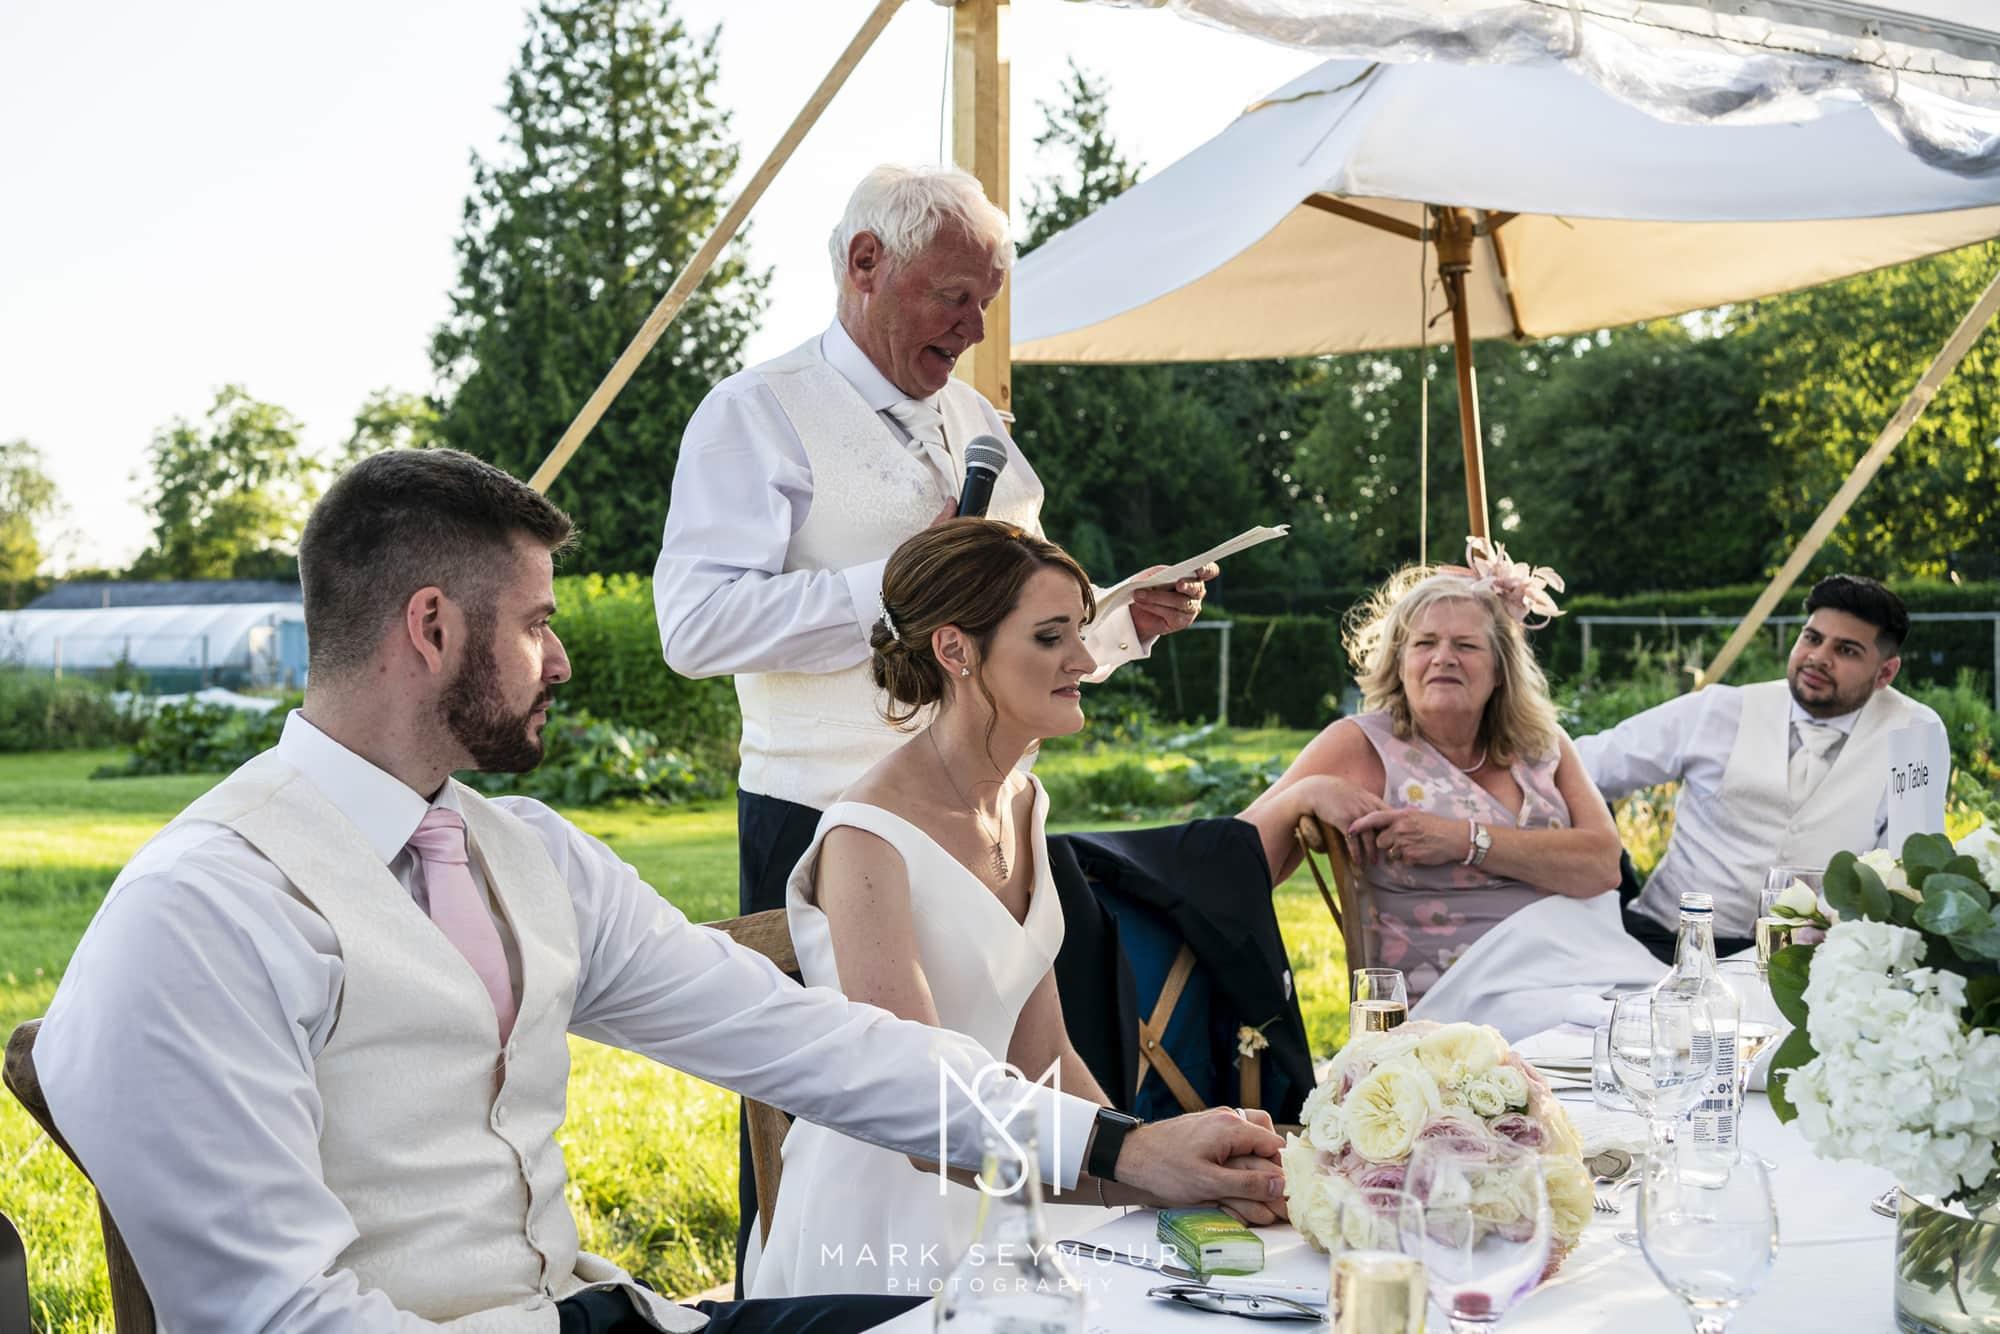 Barnsley House Wedding Photographer - Olivia and James' wedding 30